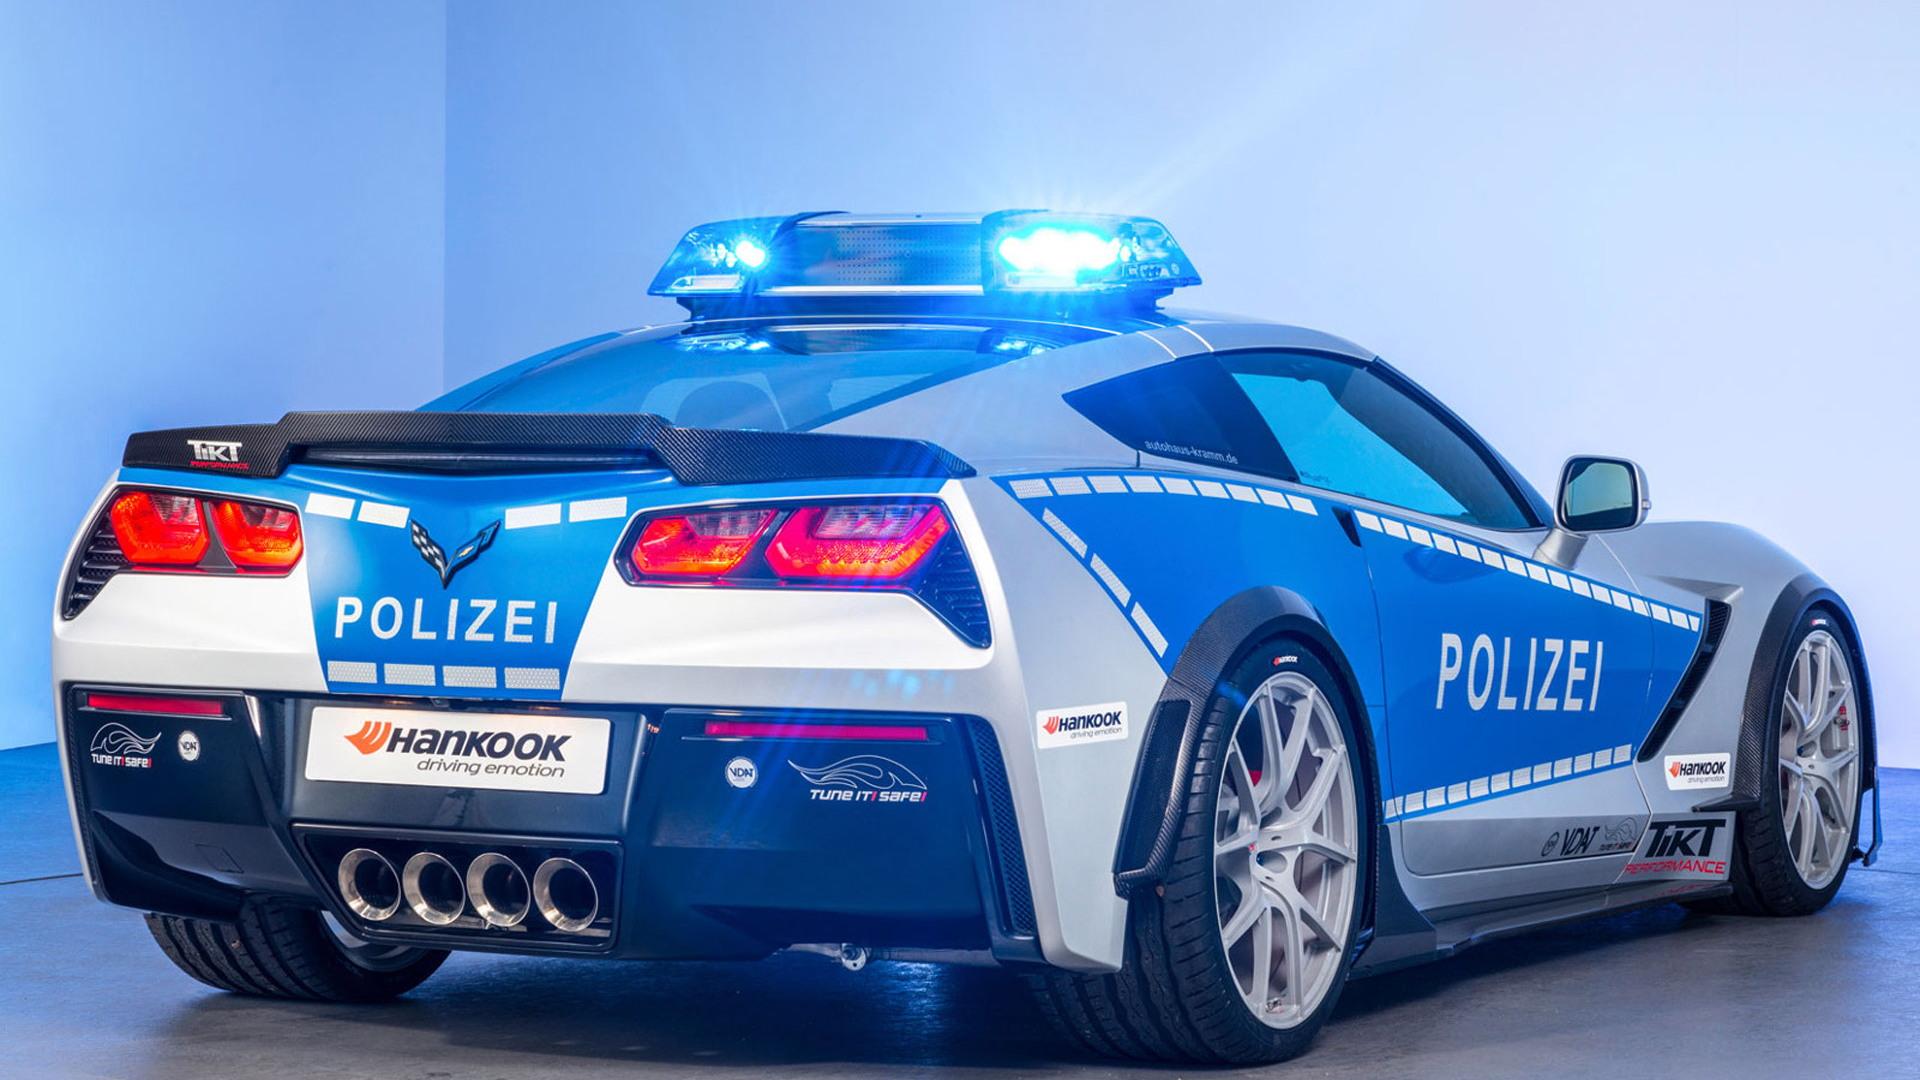 Tune It! Safe! Chevrolet Corvette Stingray by TIKT Performance, 2015 Essen Motor Show